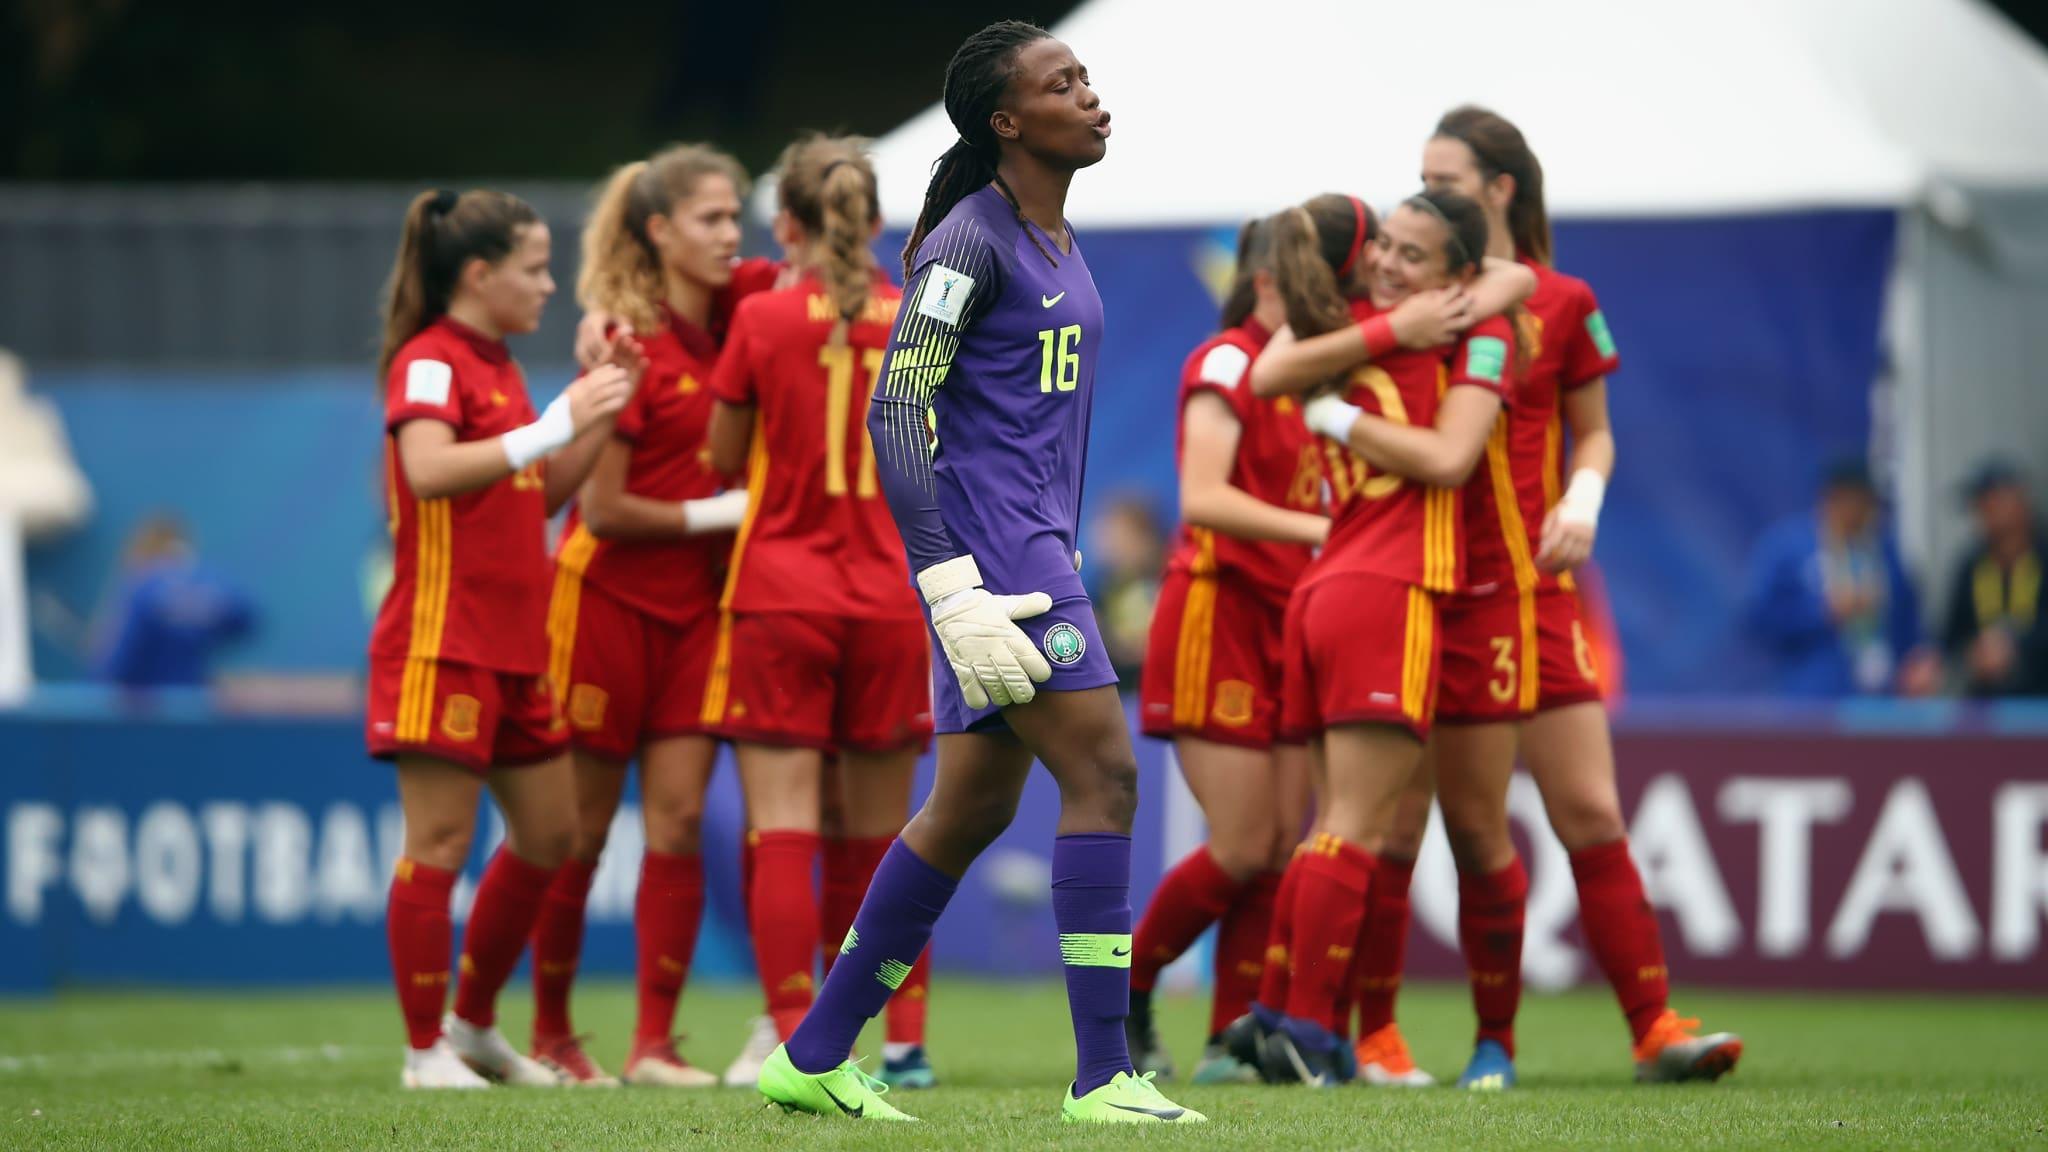 L'Espagne se qualifie mais a douté (photo FIFA.com)